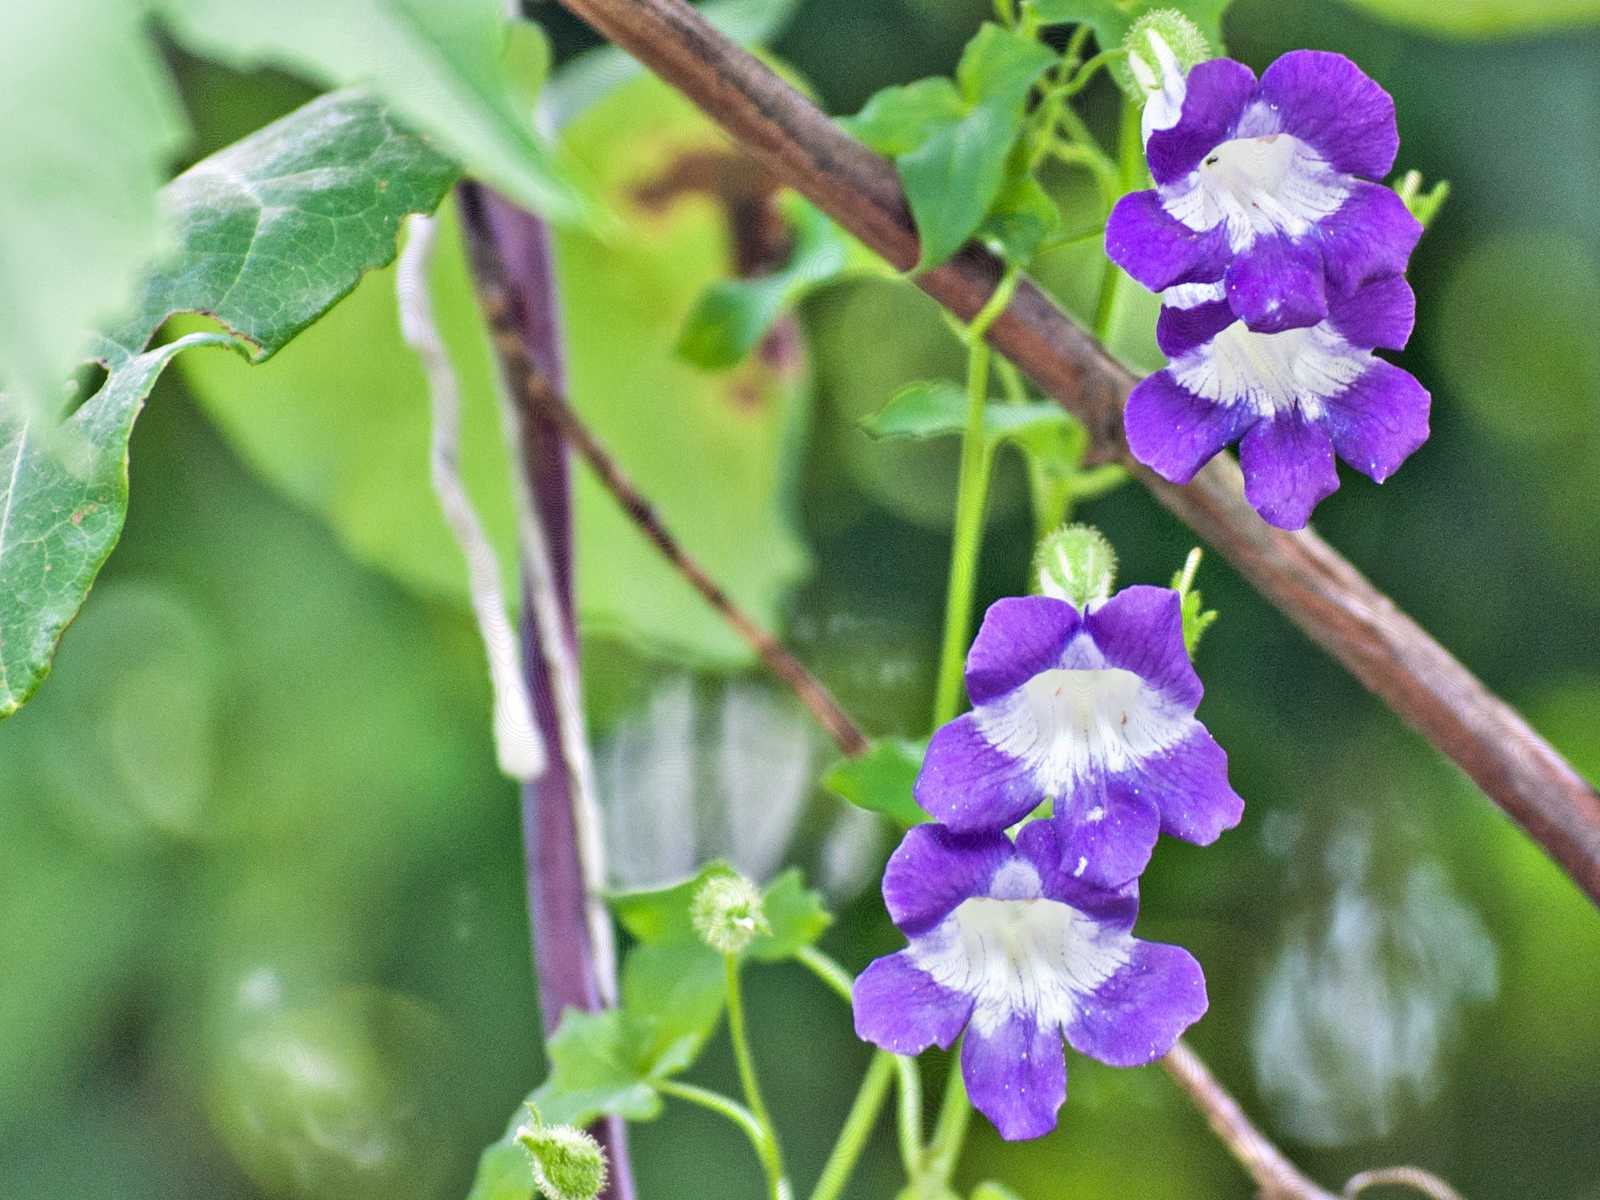 How to Grow Asarina, the Climbing Snapdragon Vine